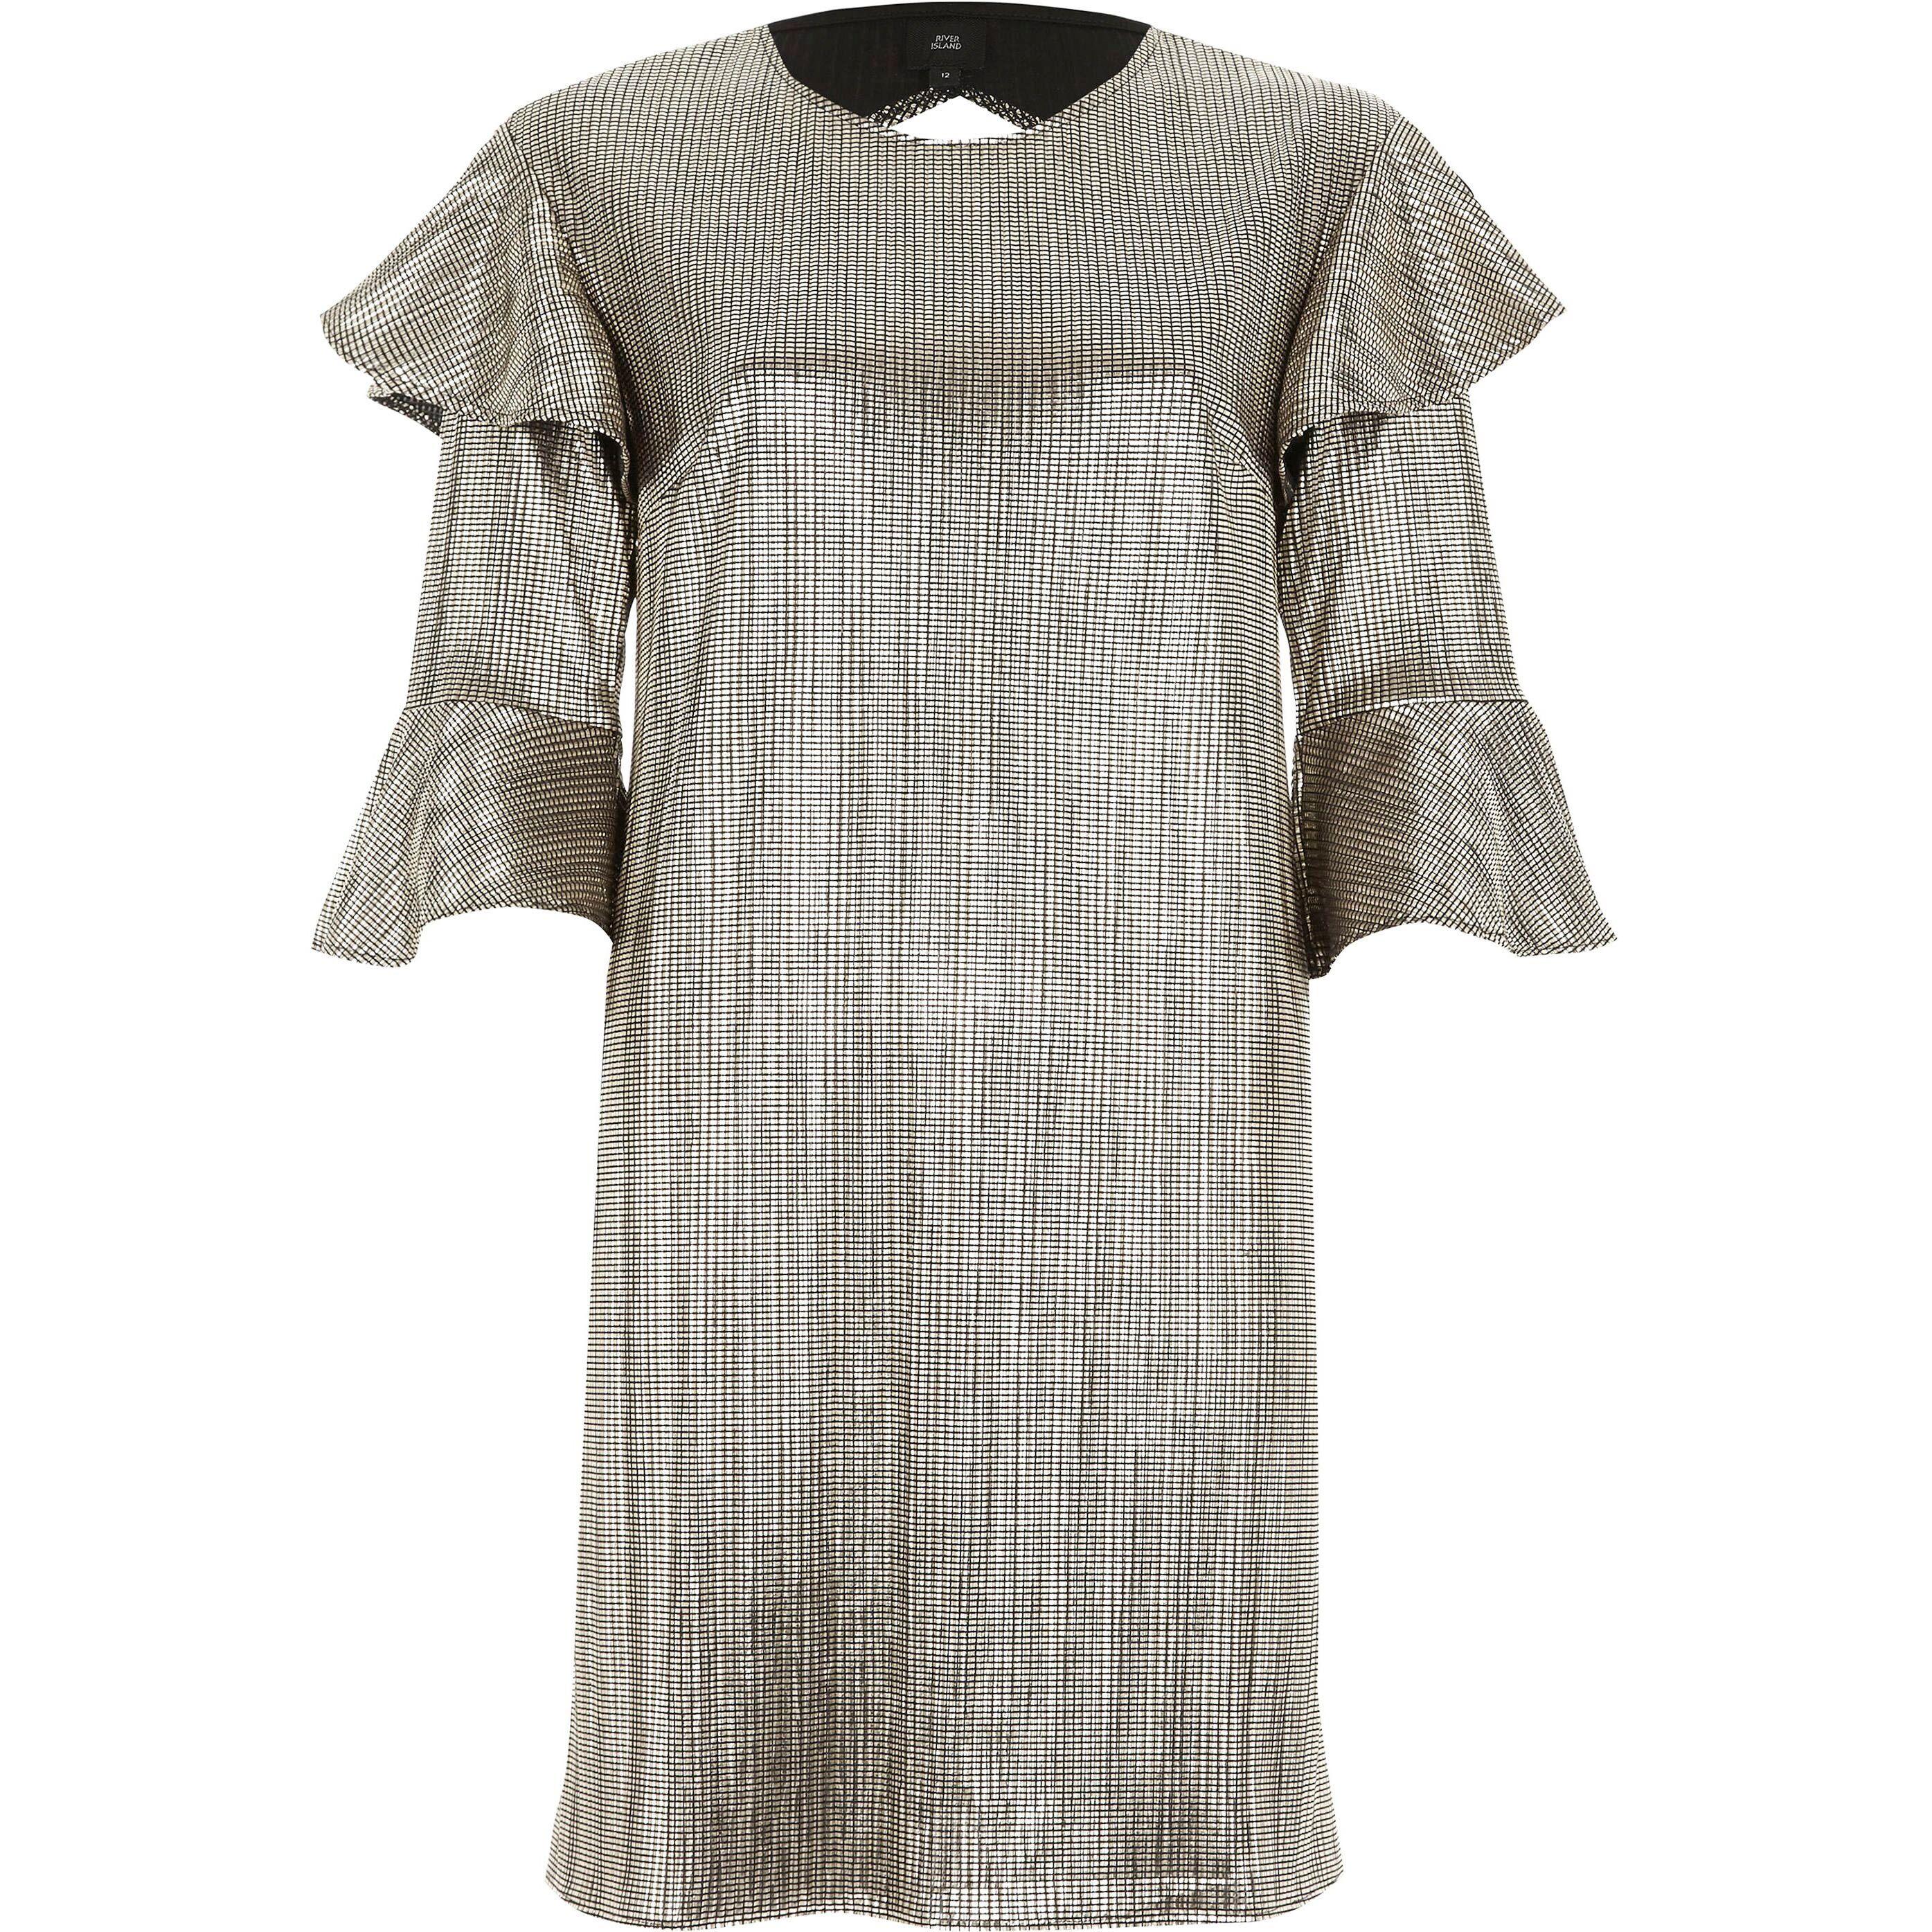 River Island Gold foil frill T-shirt dress (6)